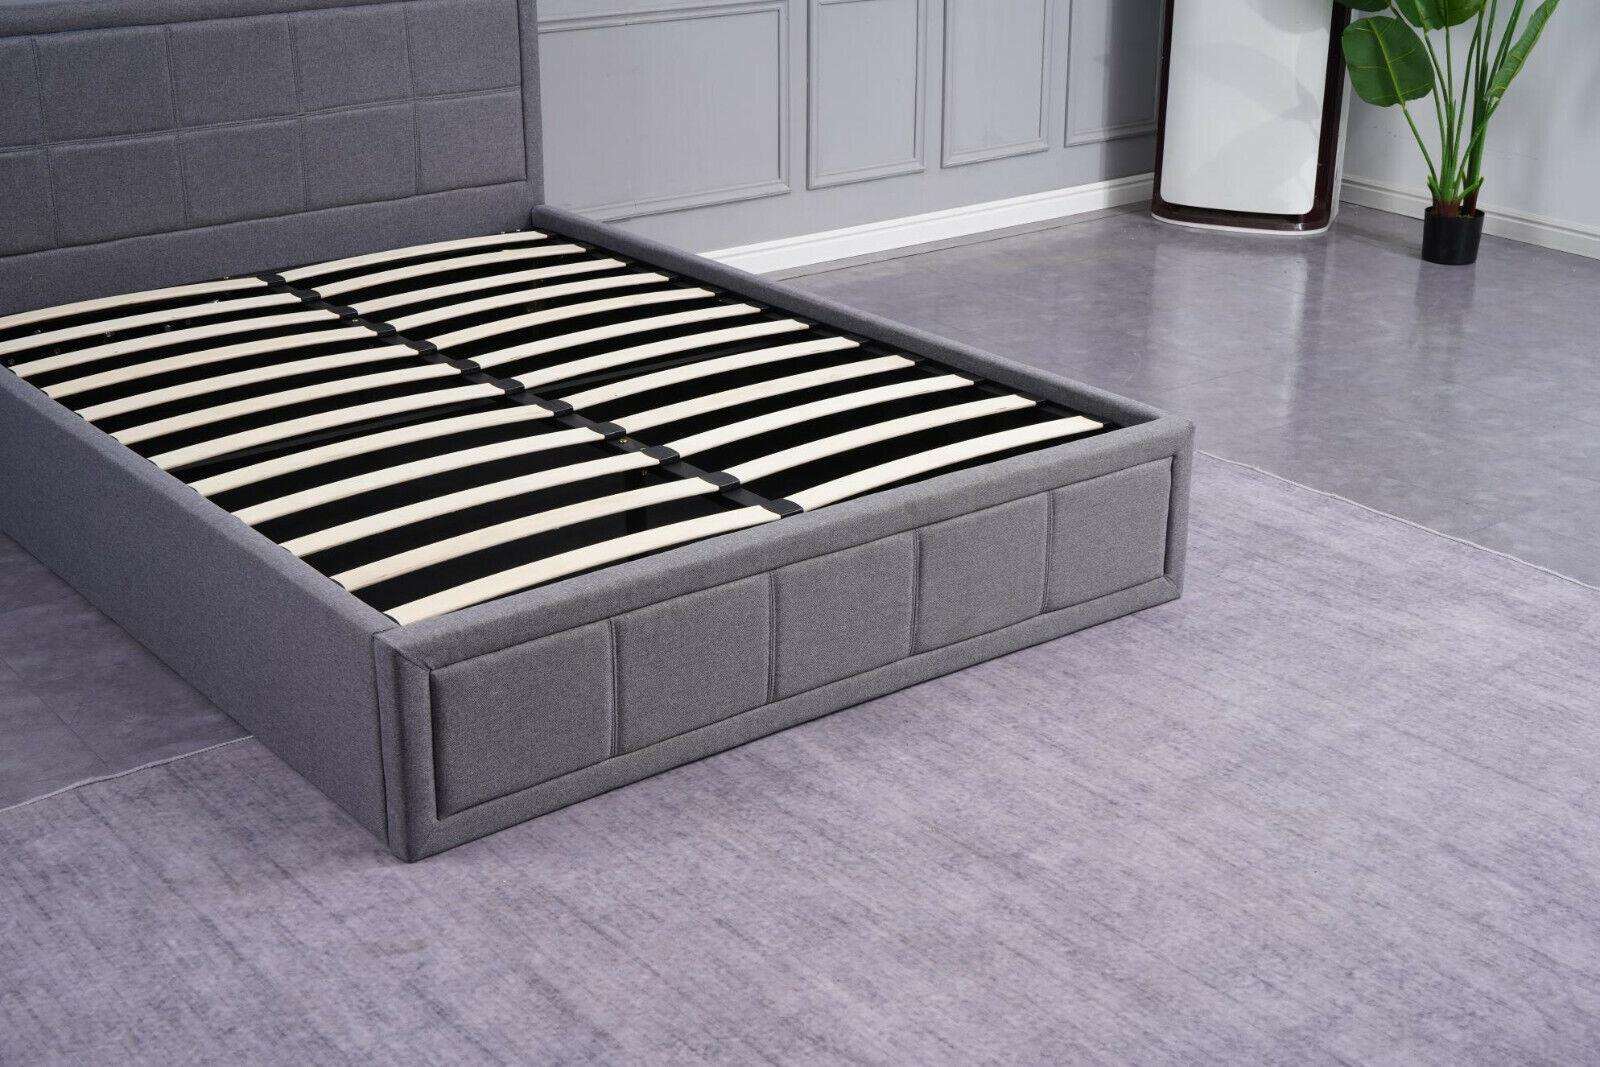 Kosy Koala Grey Upholstered Storage Ottoman Gas Side Lift Bed Natural Linen Fabric Bed 3ft Single